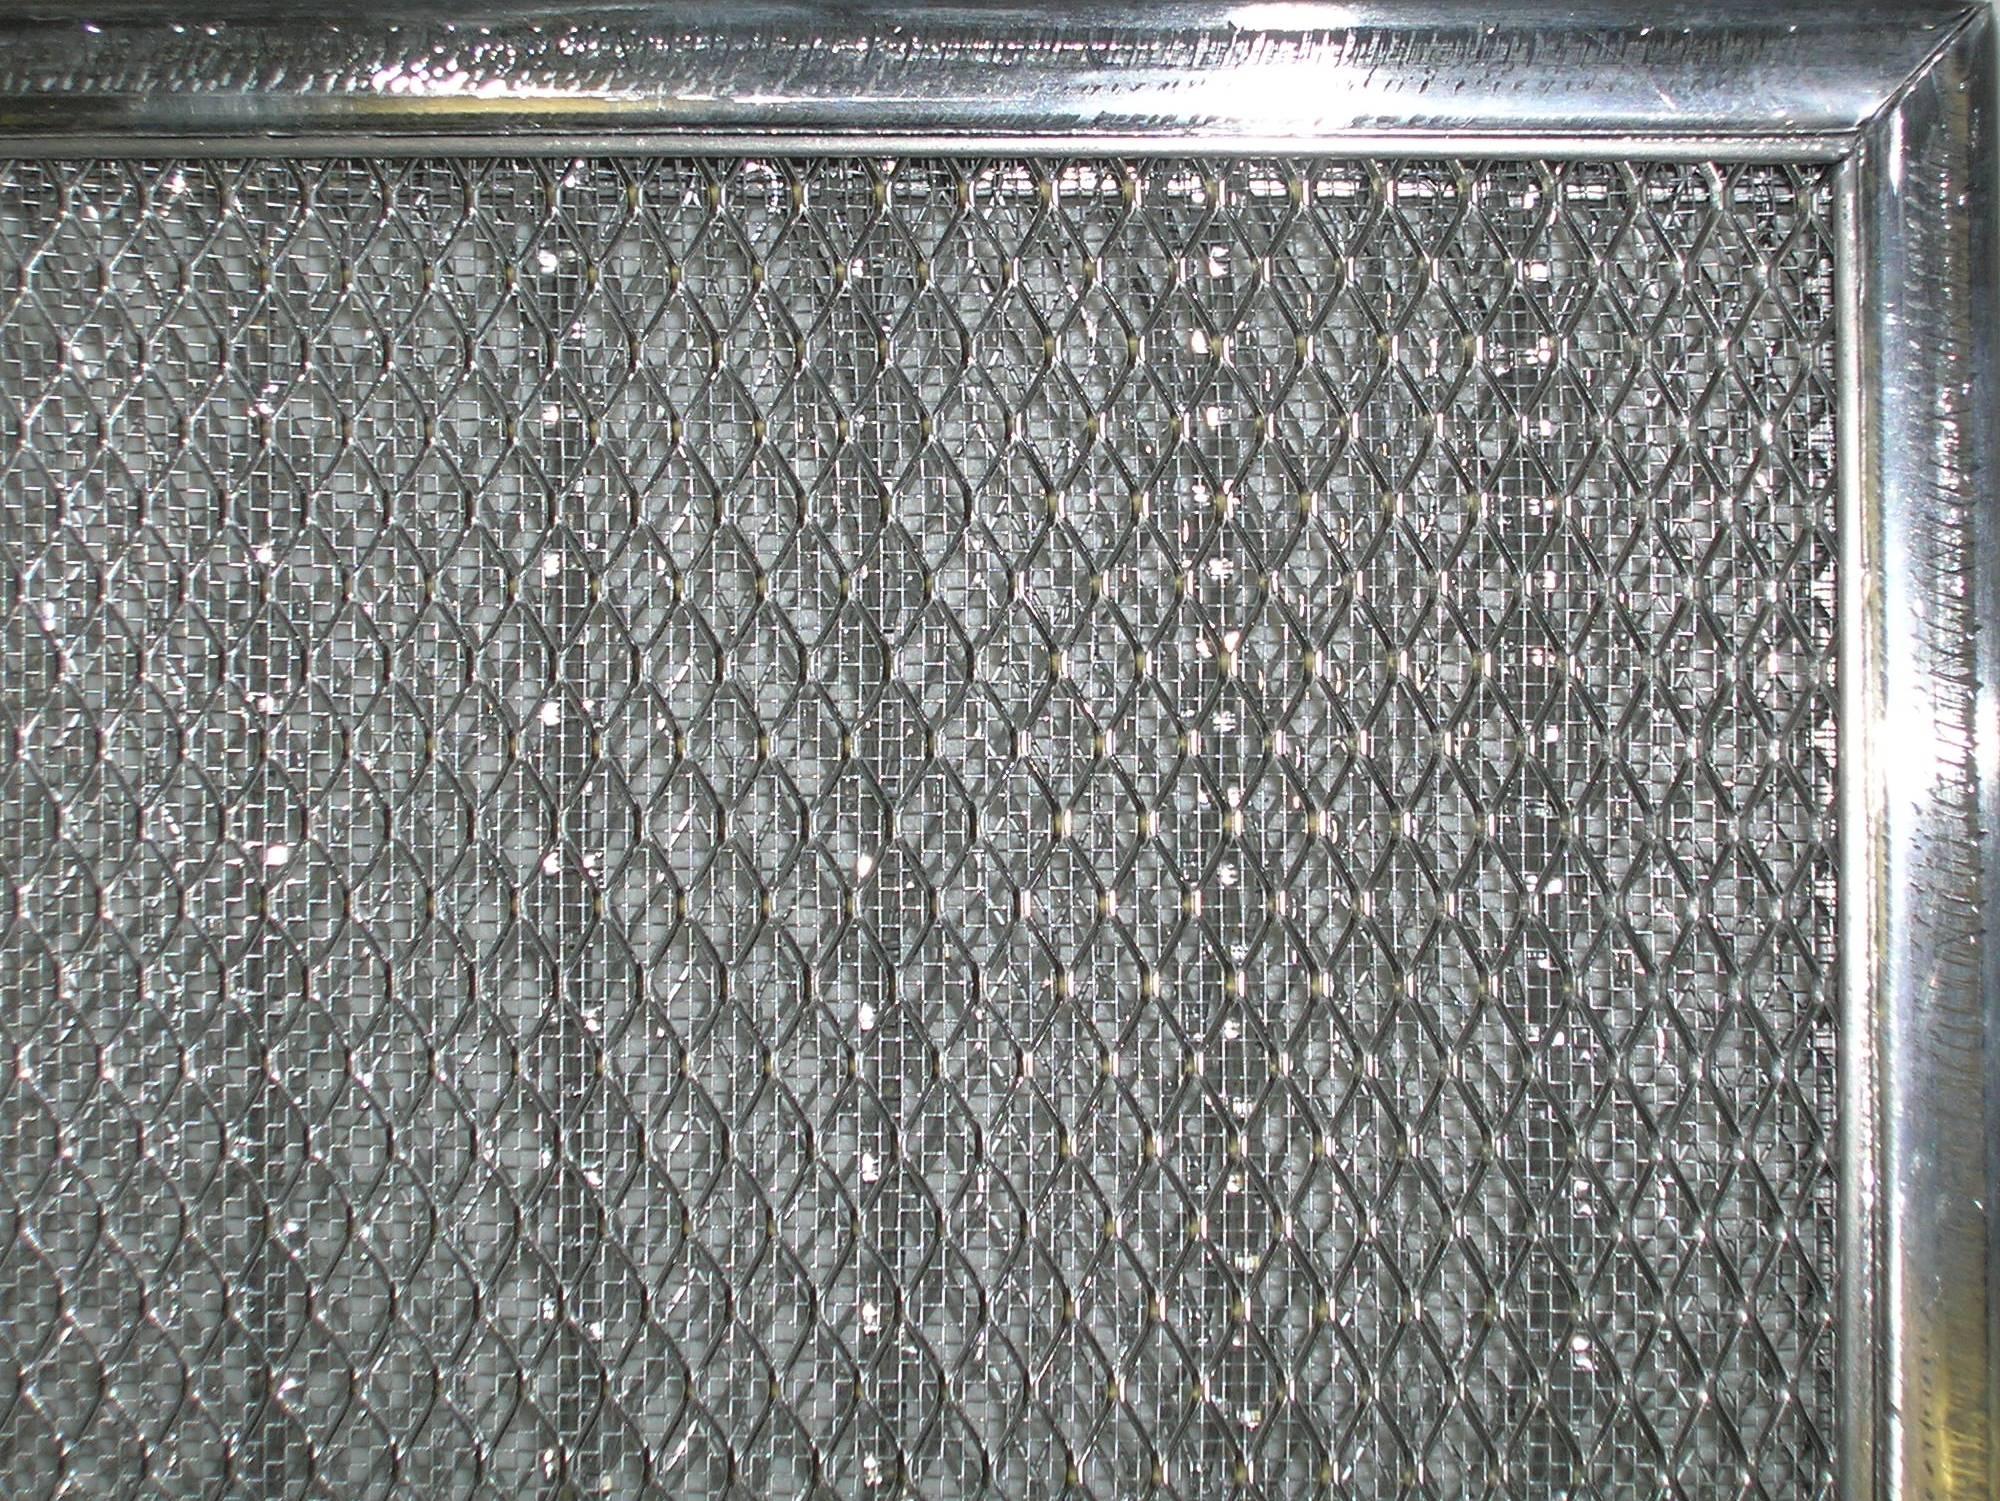 oem-metal-filter